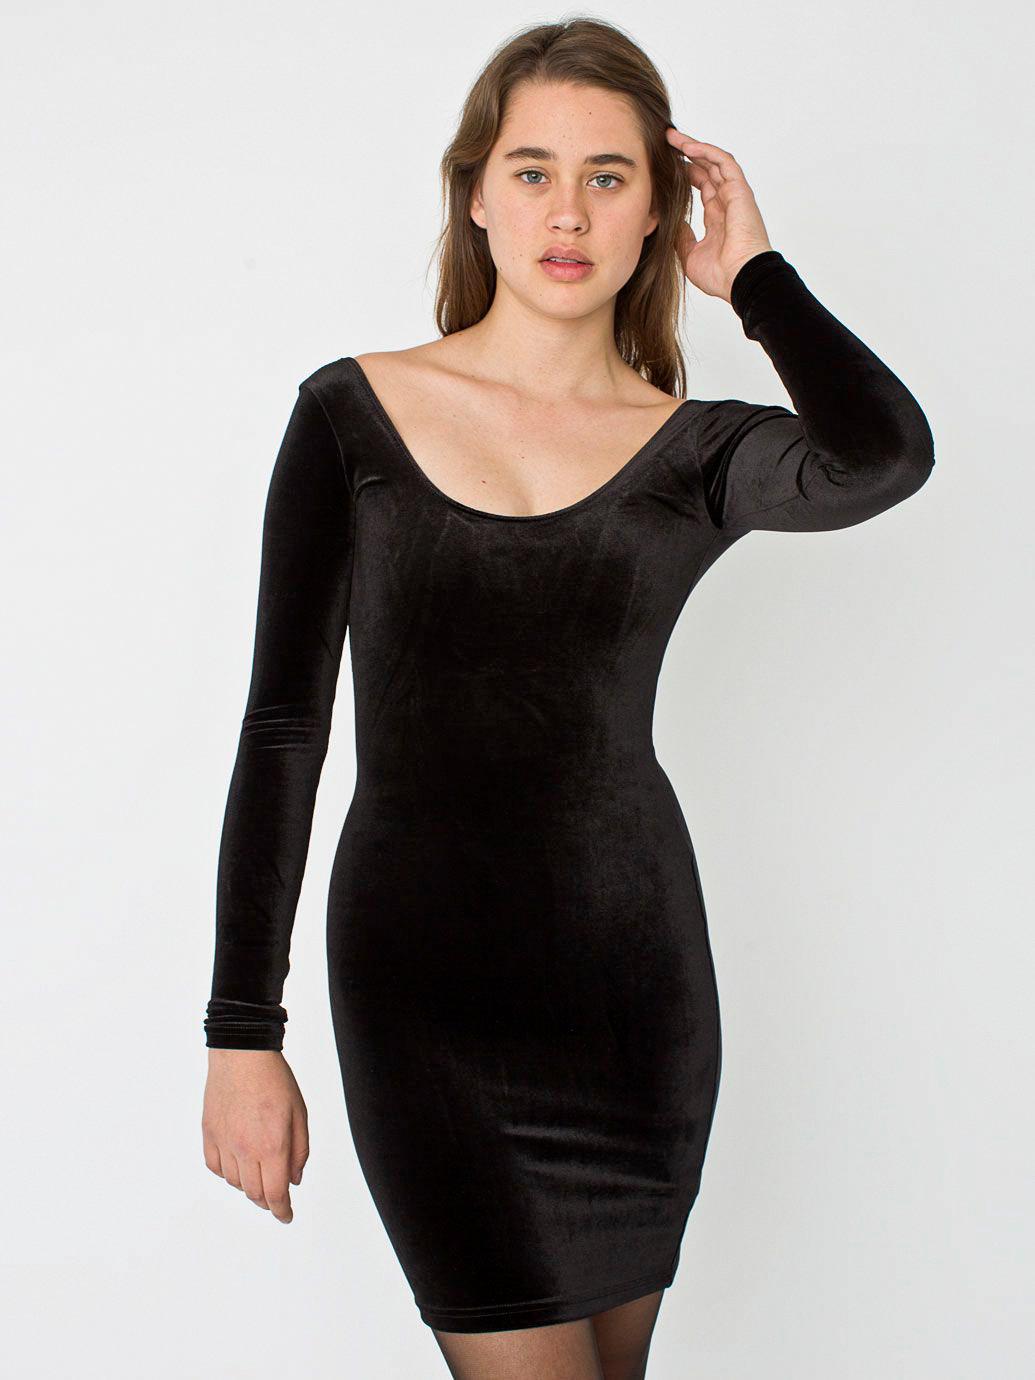 Velvet Dress Porno 13